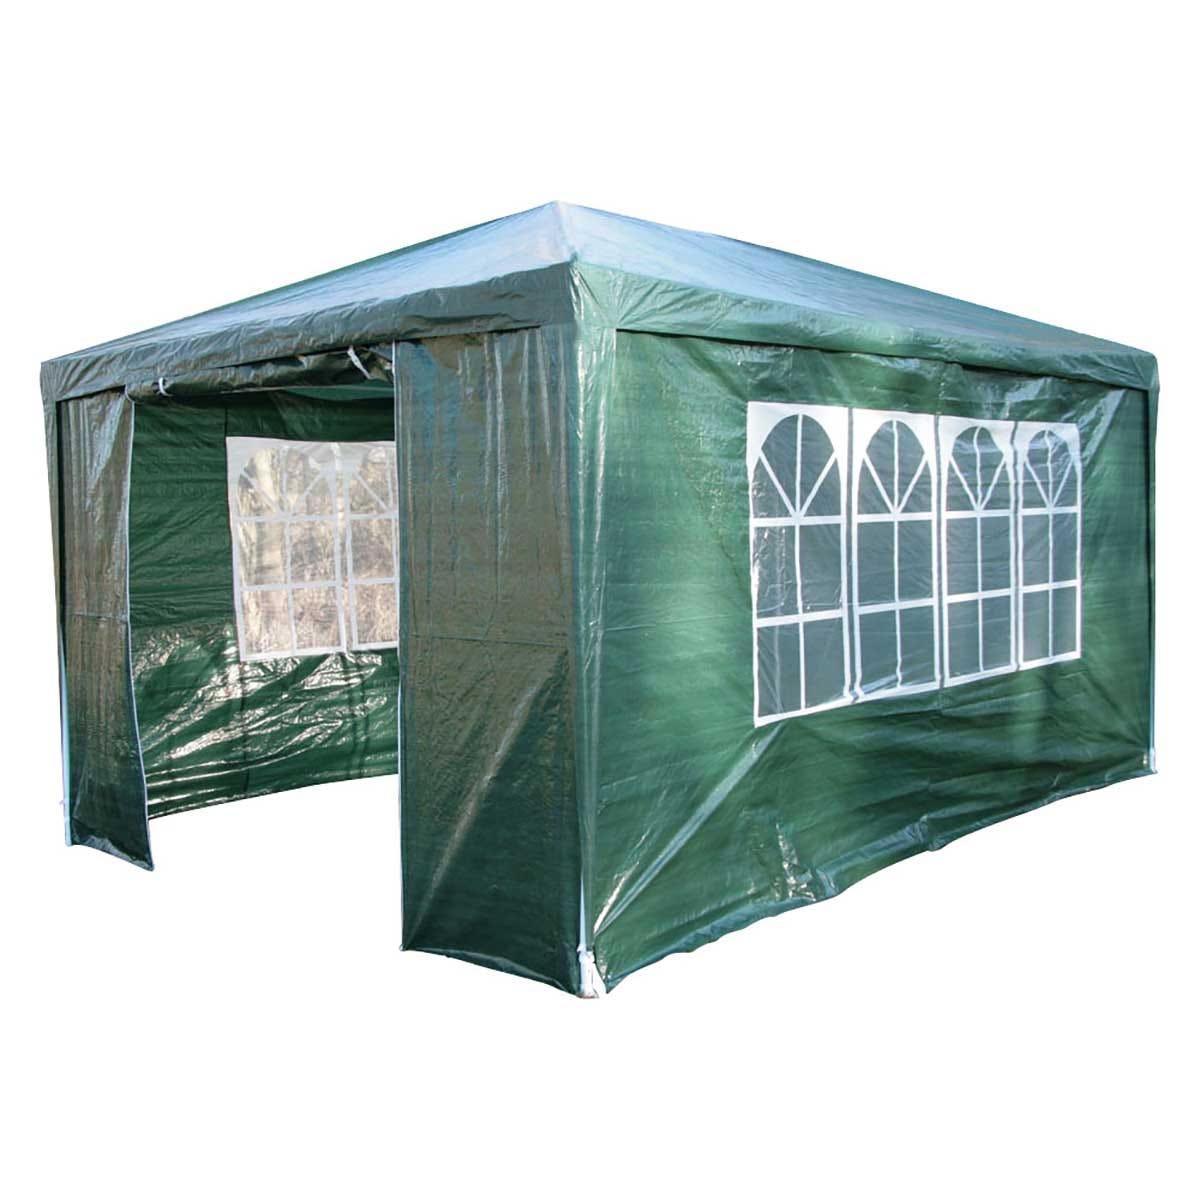 Airwave 4m x 3m Value Party Tent Gazebo - Green